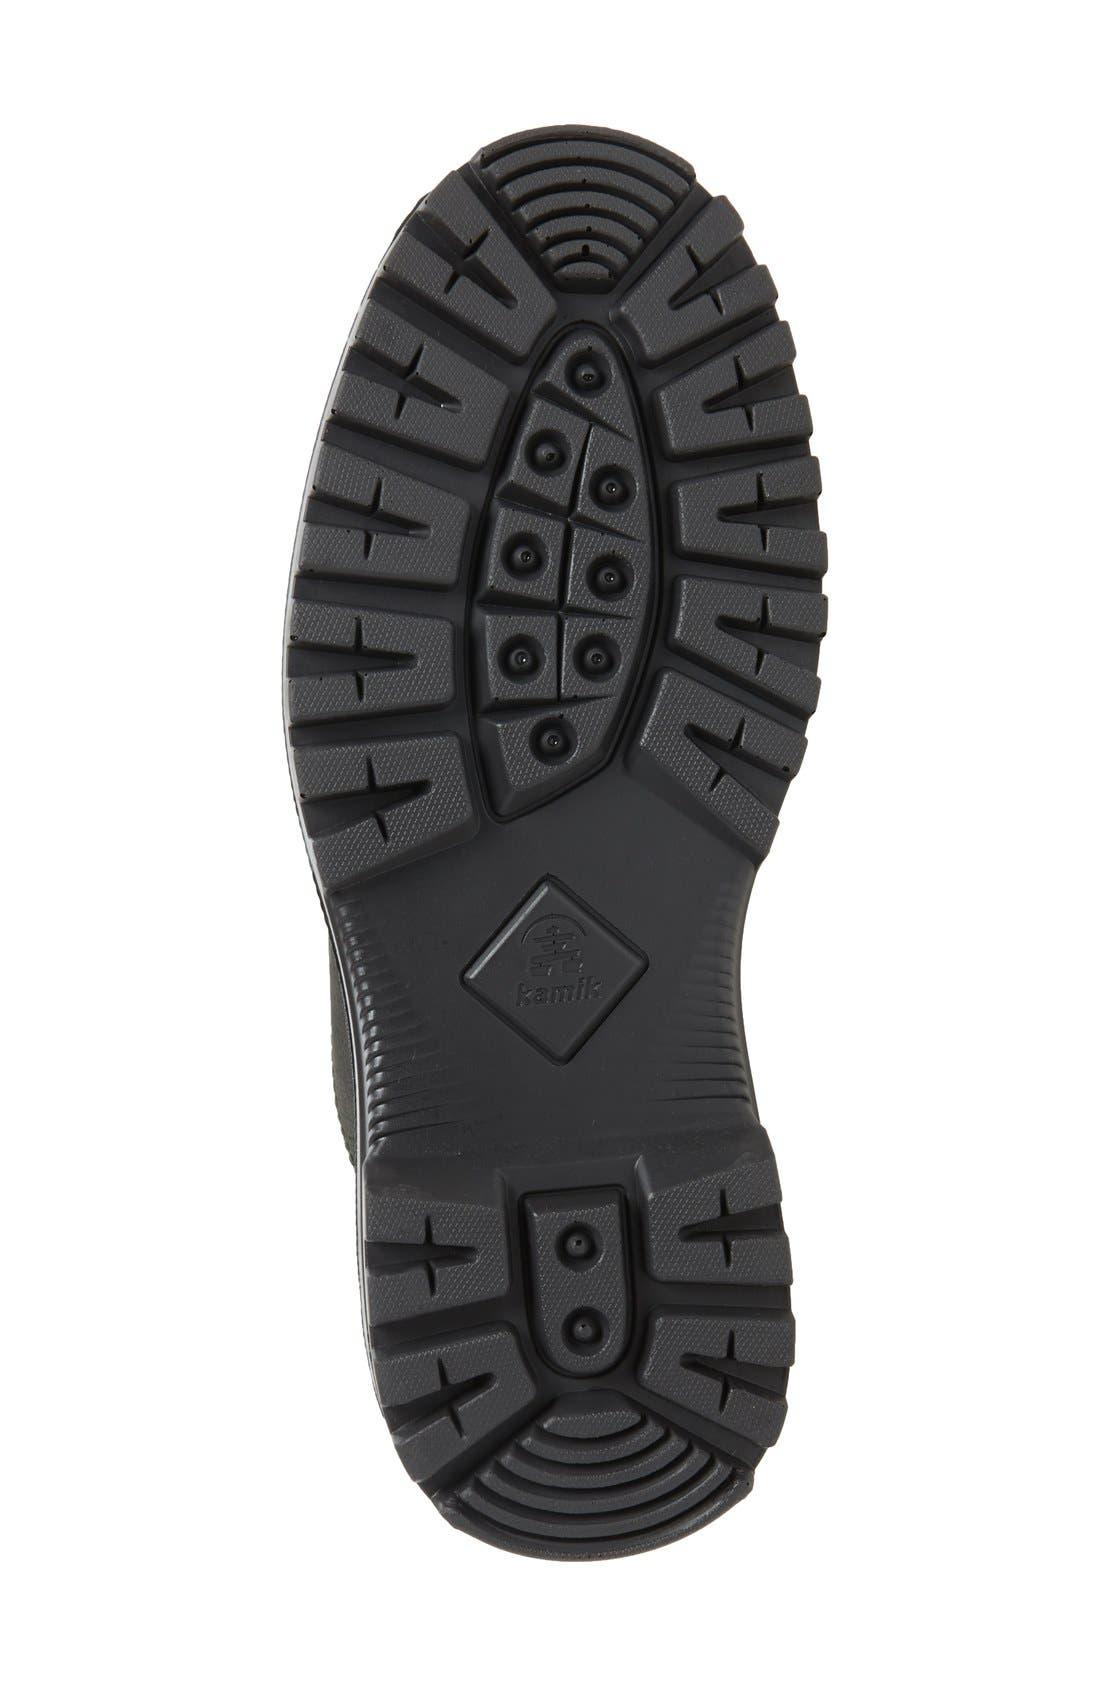 Griffon Snow Boot,                             Alternate thumbnail 4, color,                             Black Leather